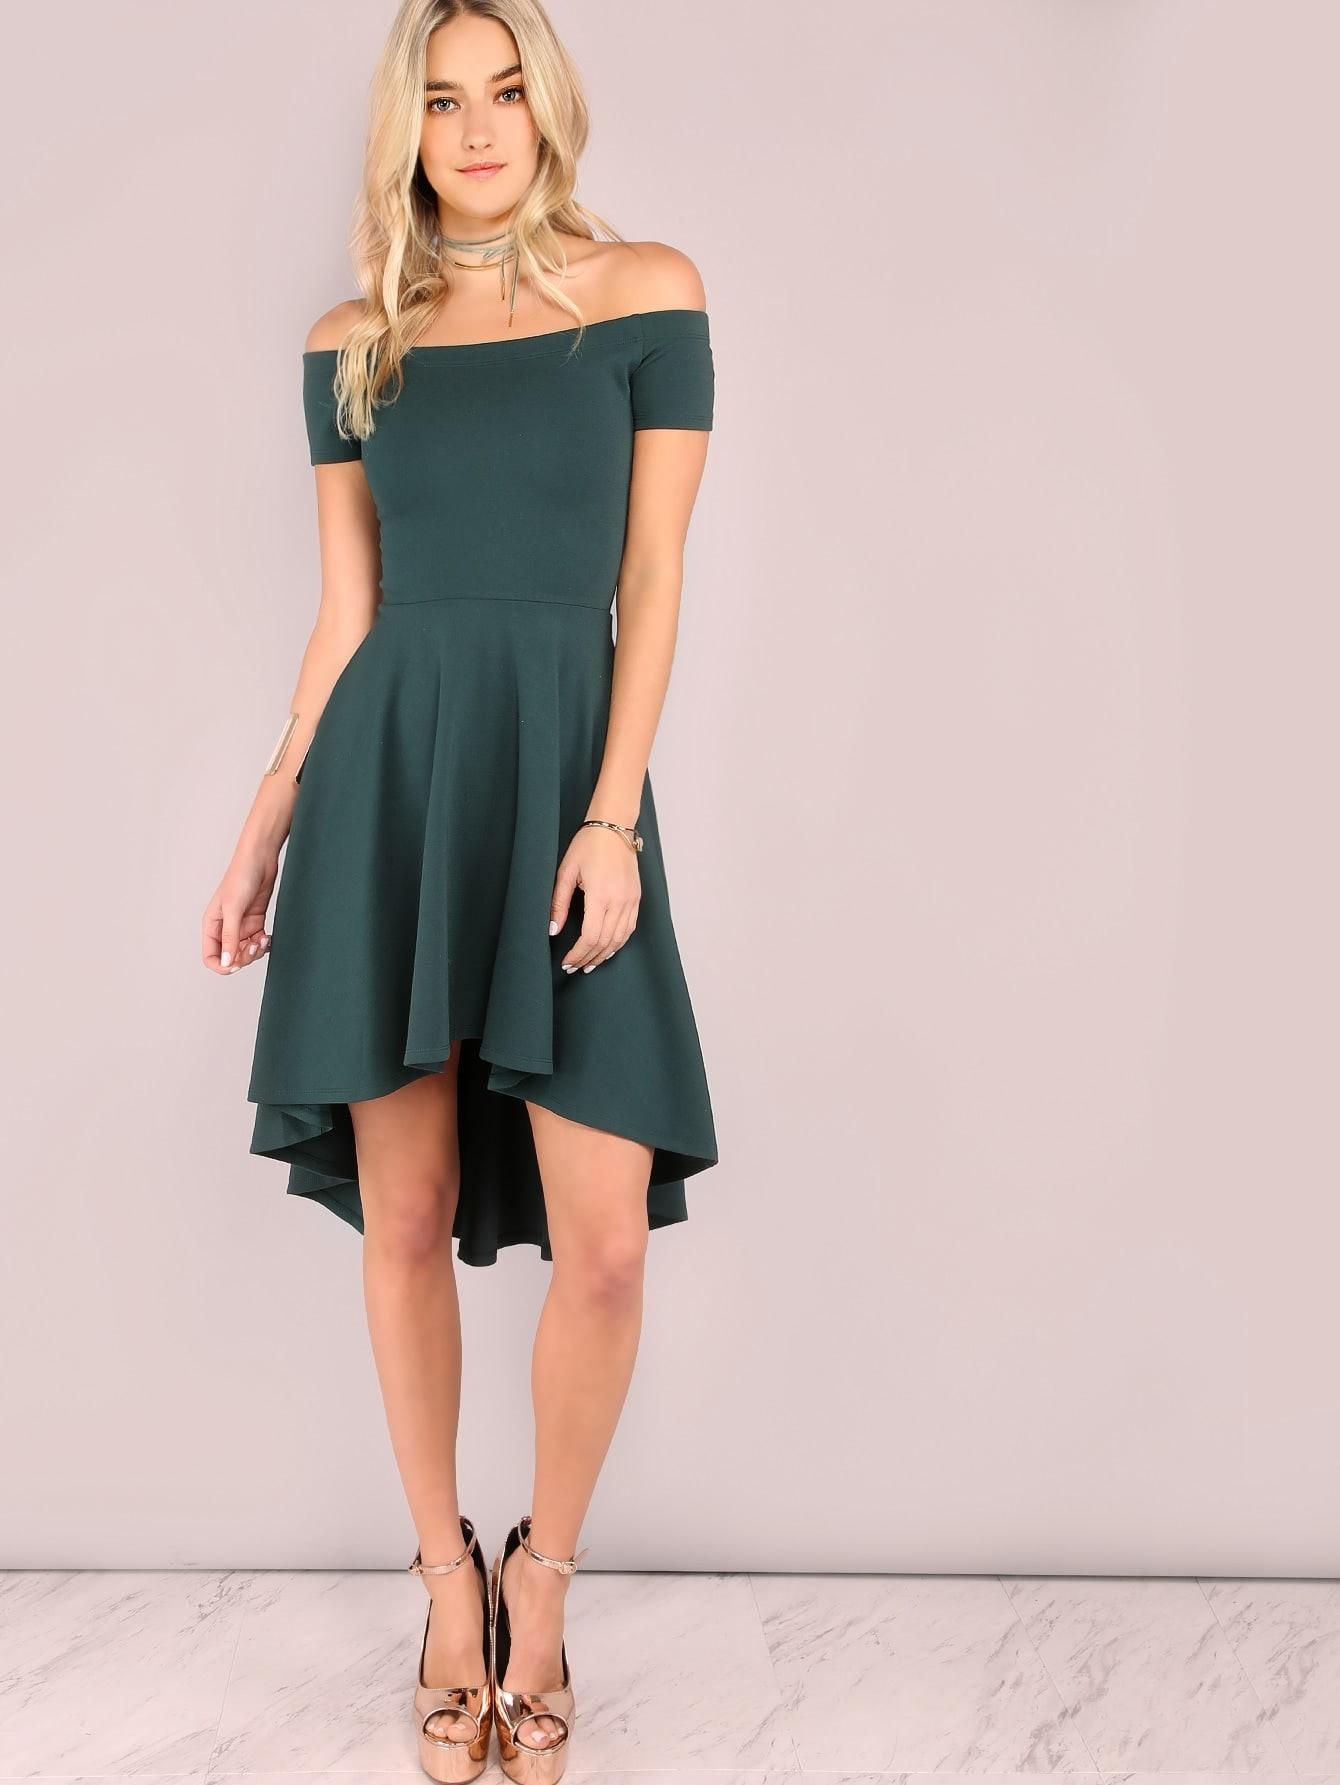 Abend Luxus Kleid Dunkelgrün Lang Spezialgebiet10 Erstaunlich Kleid Dunkelgrün Lang für 2019